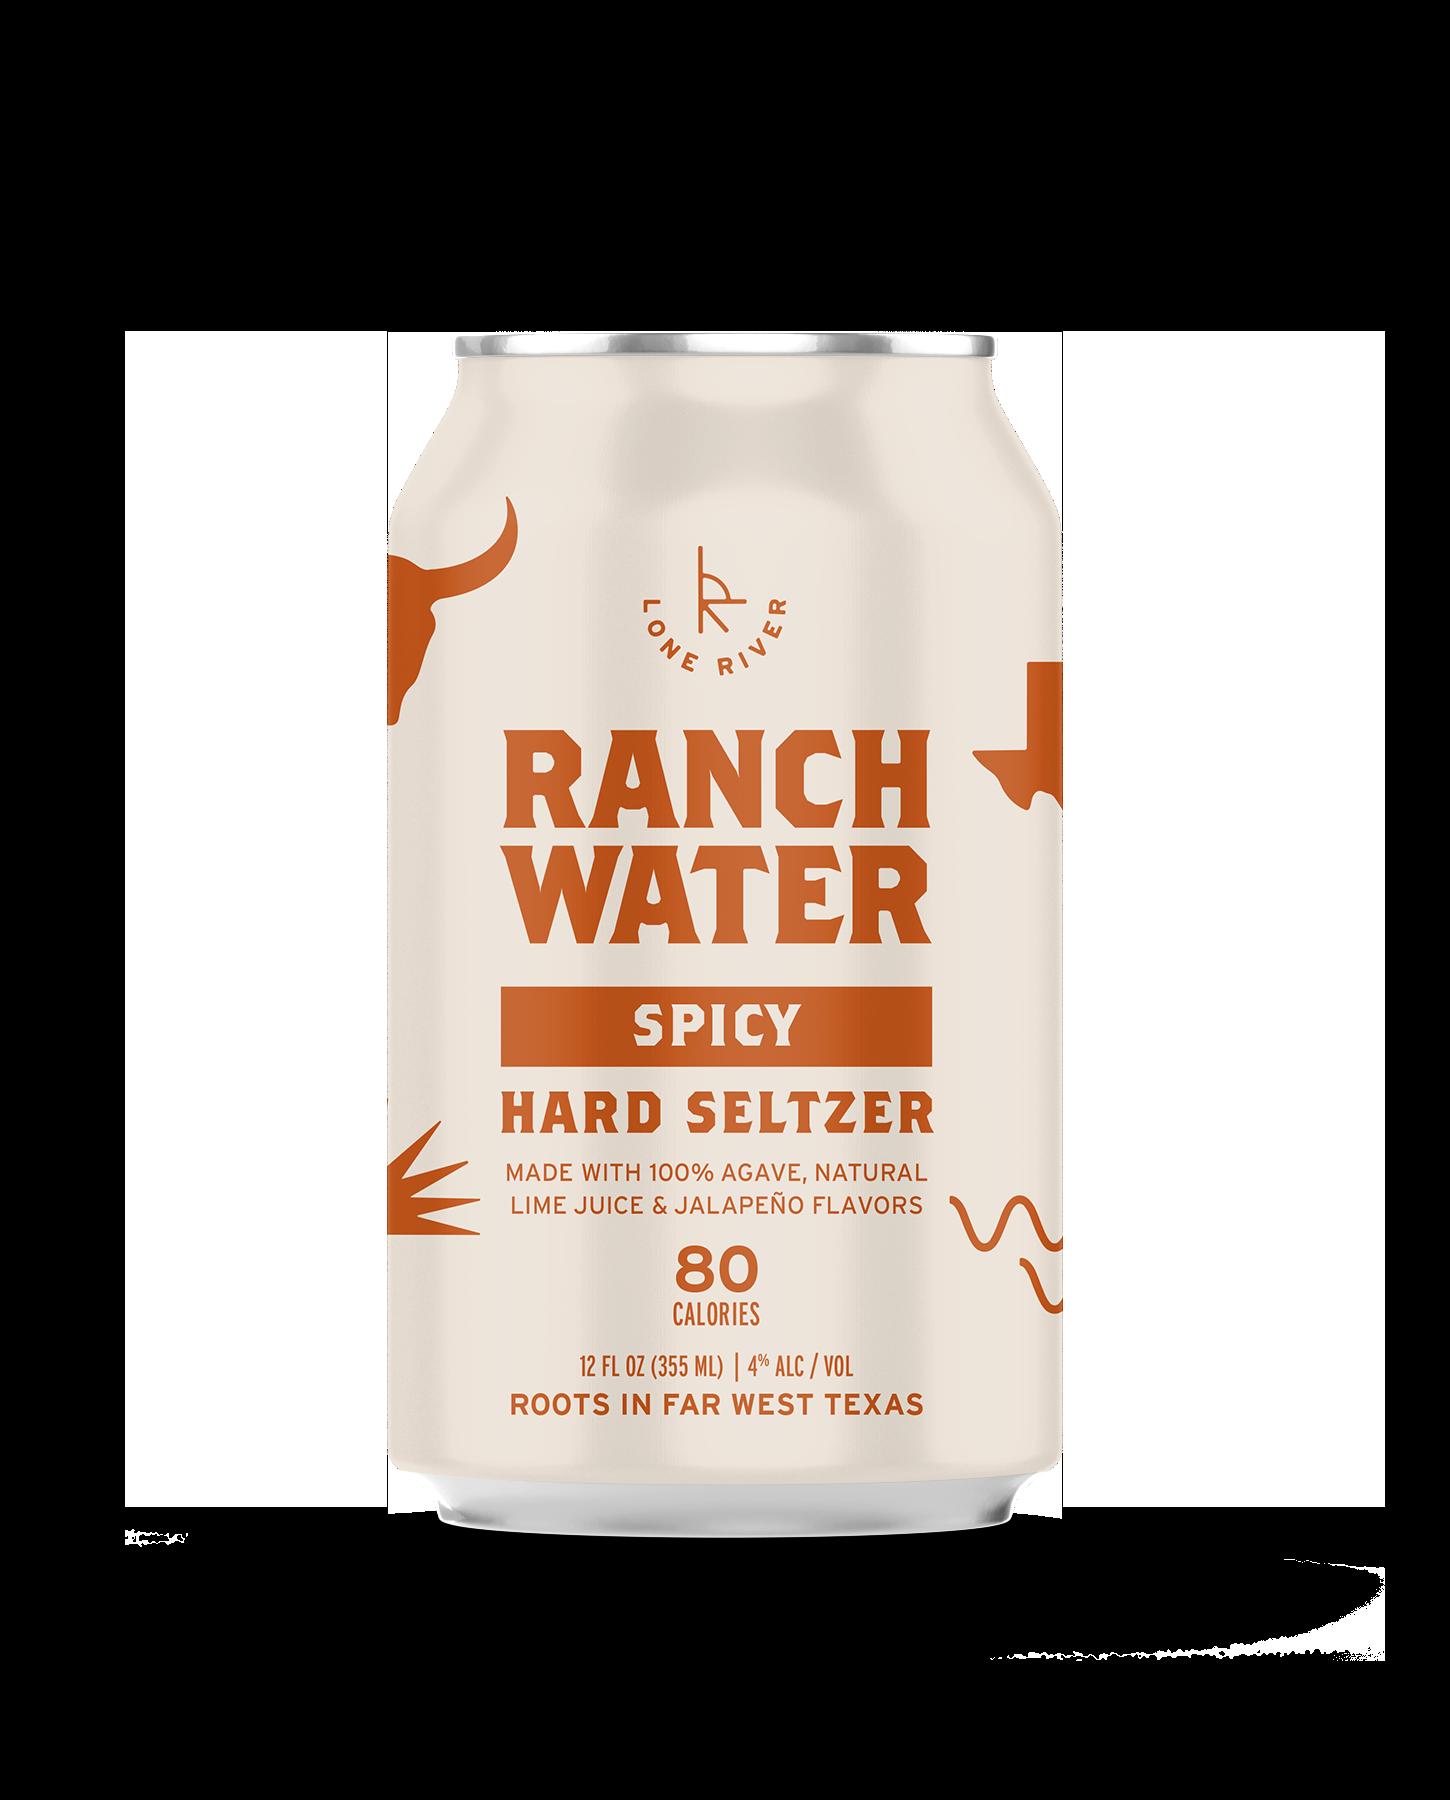 Spicy Ranch Water Hard Seltzer